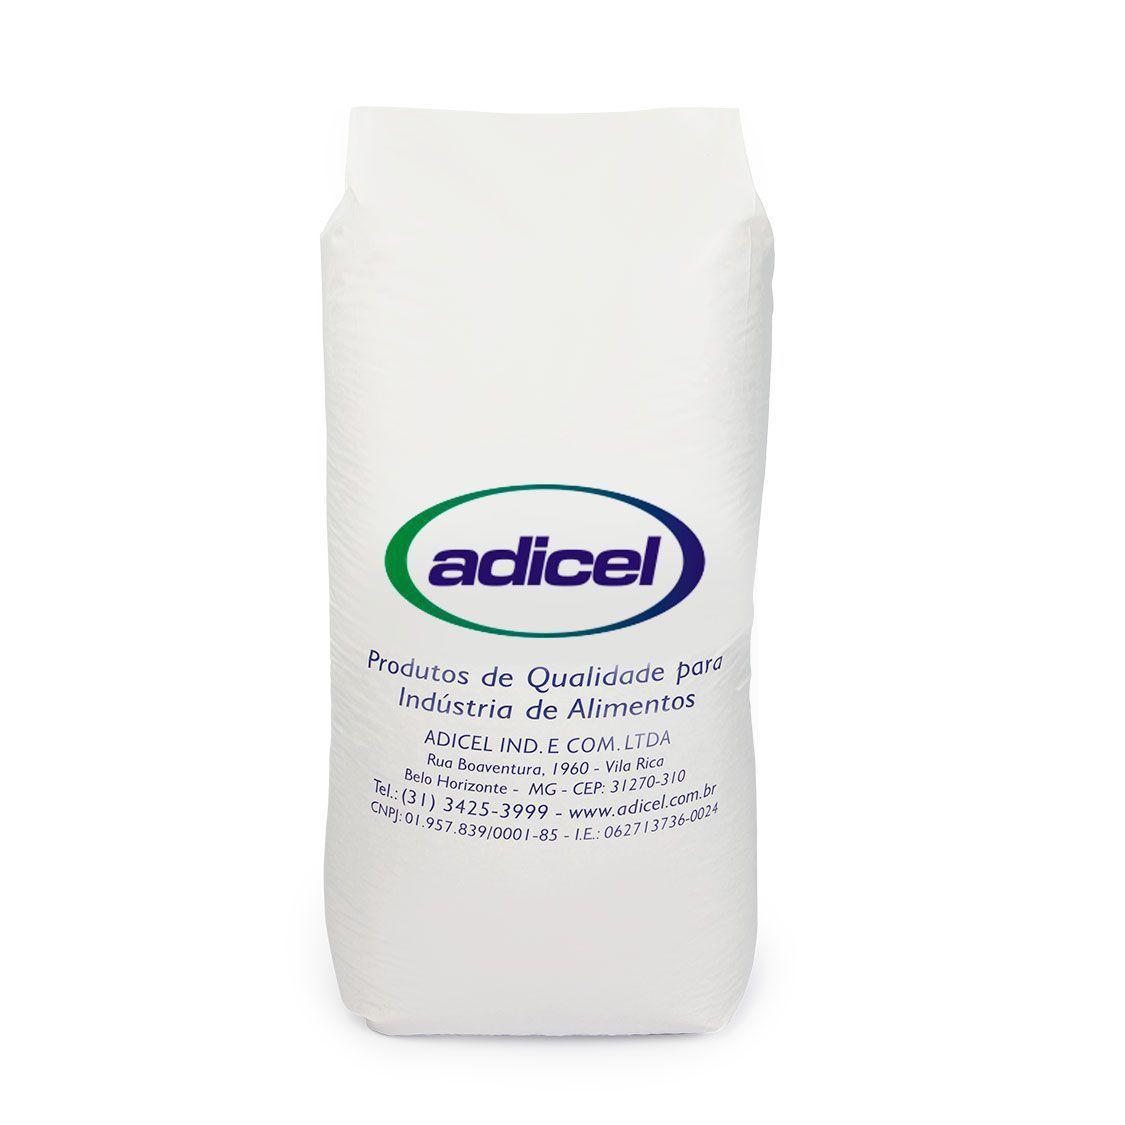 Proteína Texturizada De Soja Cor Clara Tamanho Médio - 20 kg